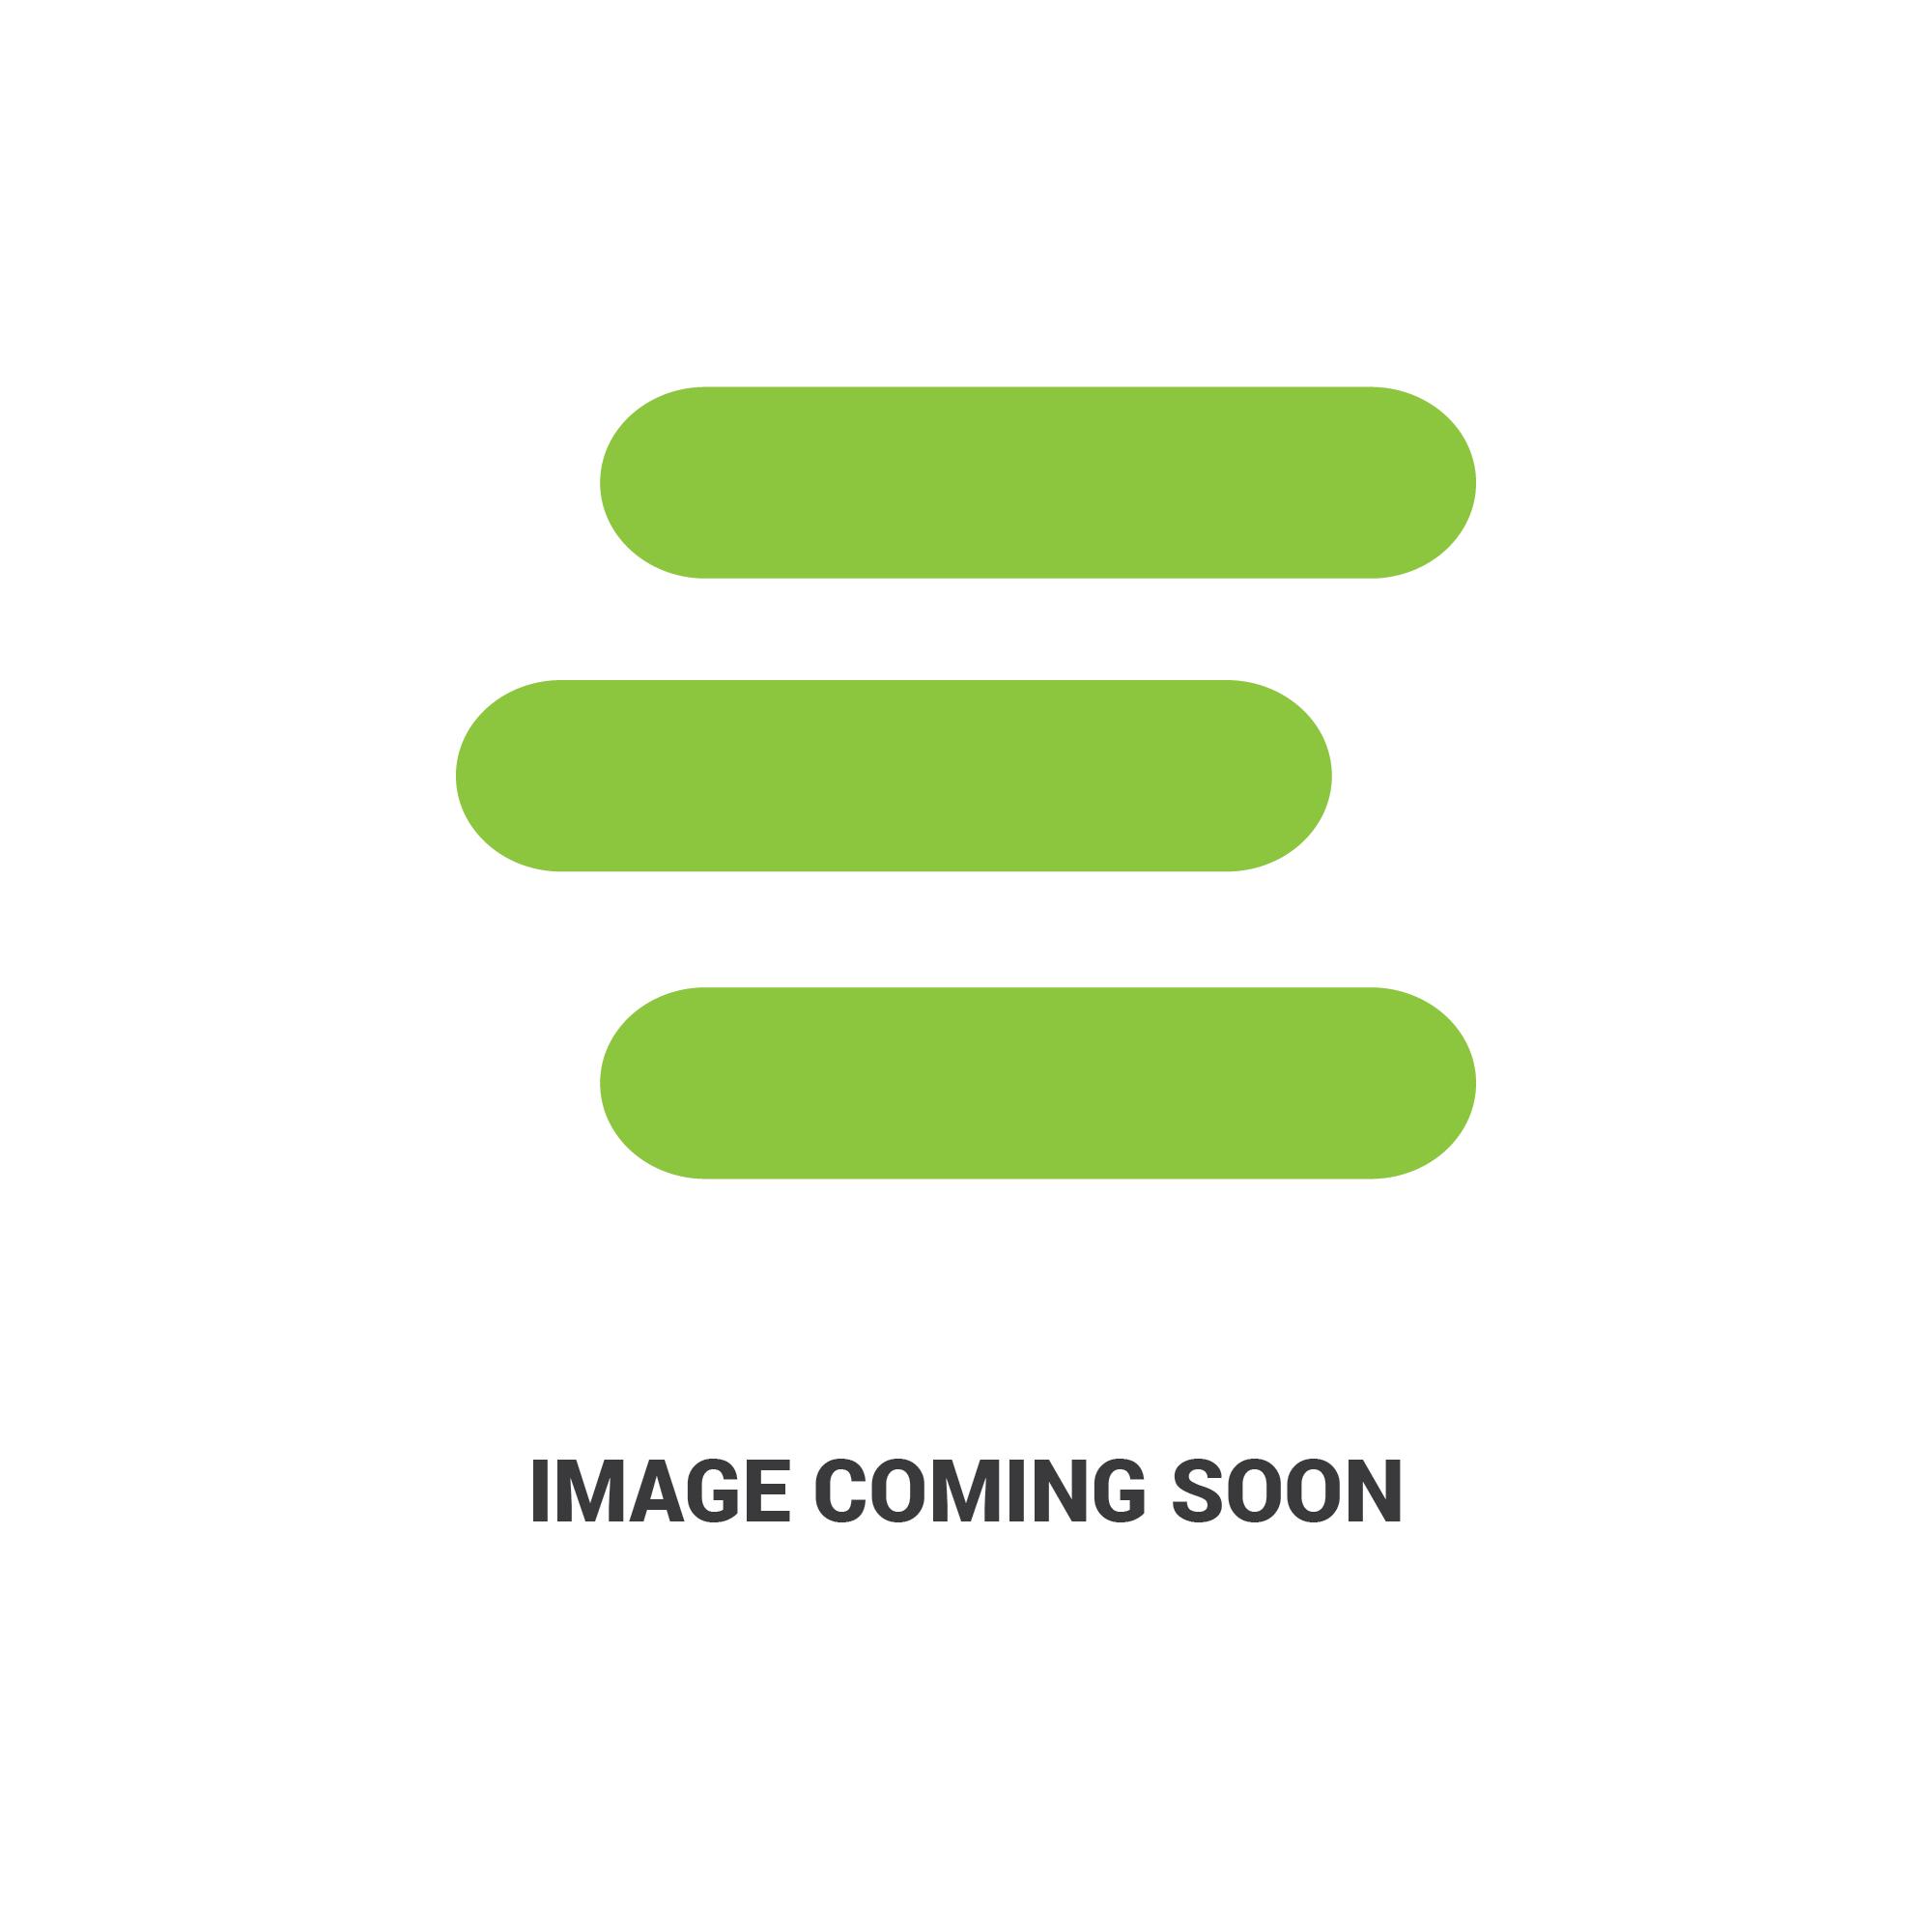 E-67308191221_1.jpg